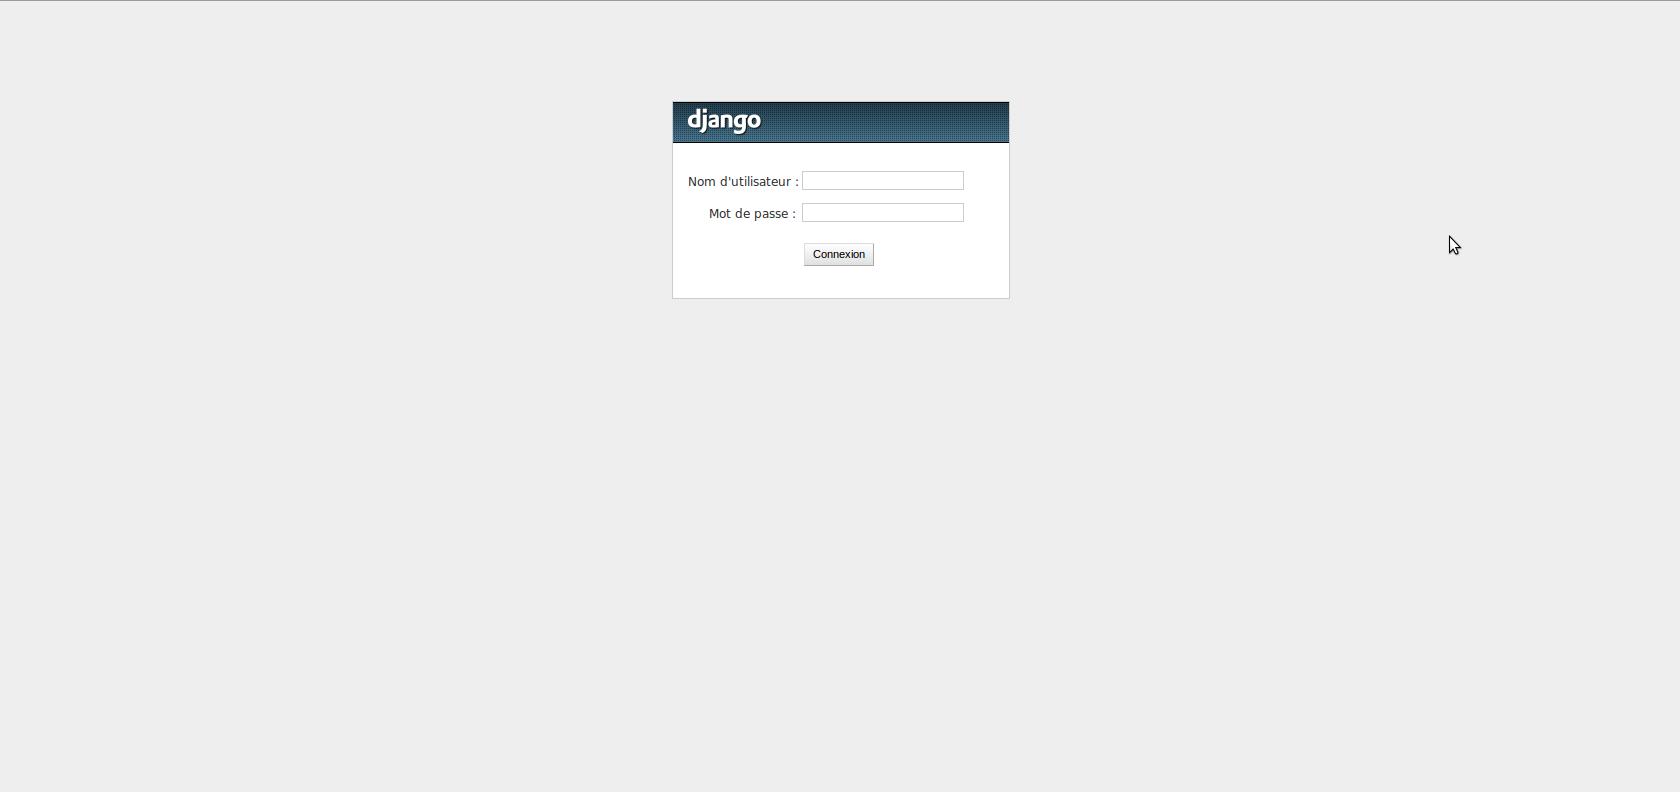 The django admin login screen